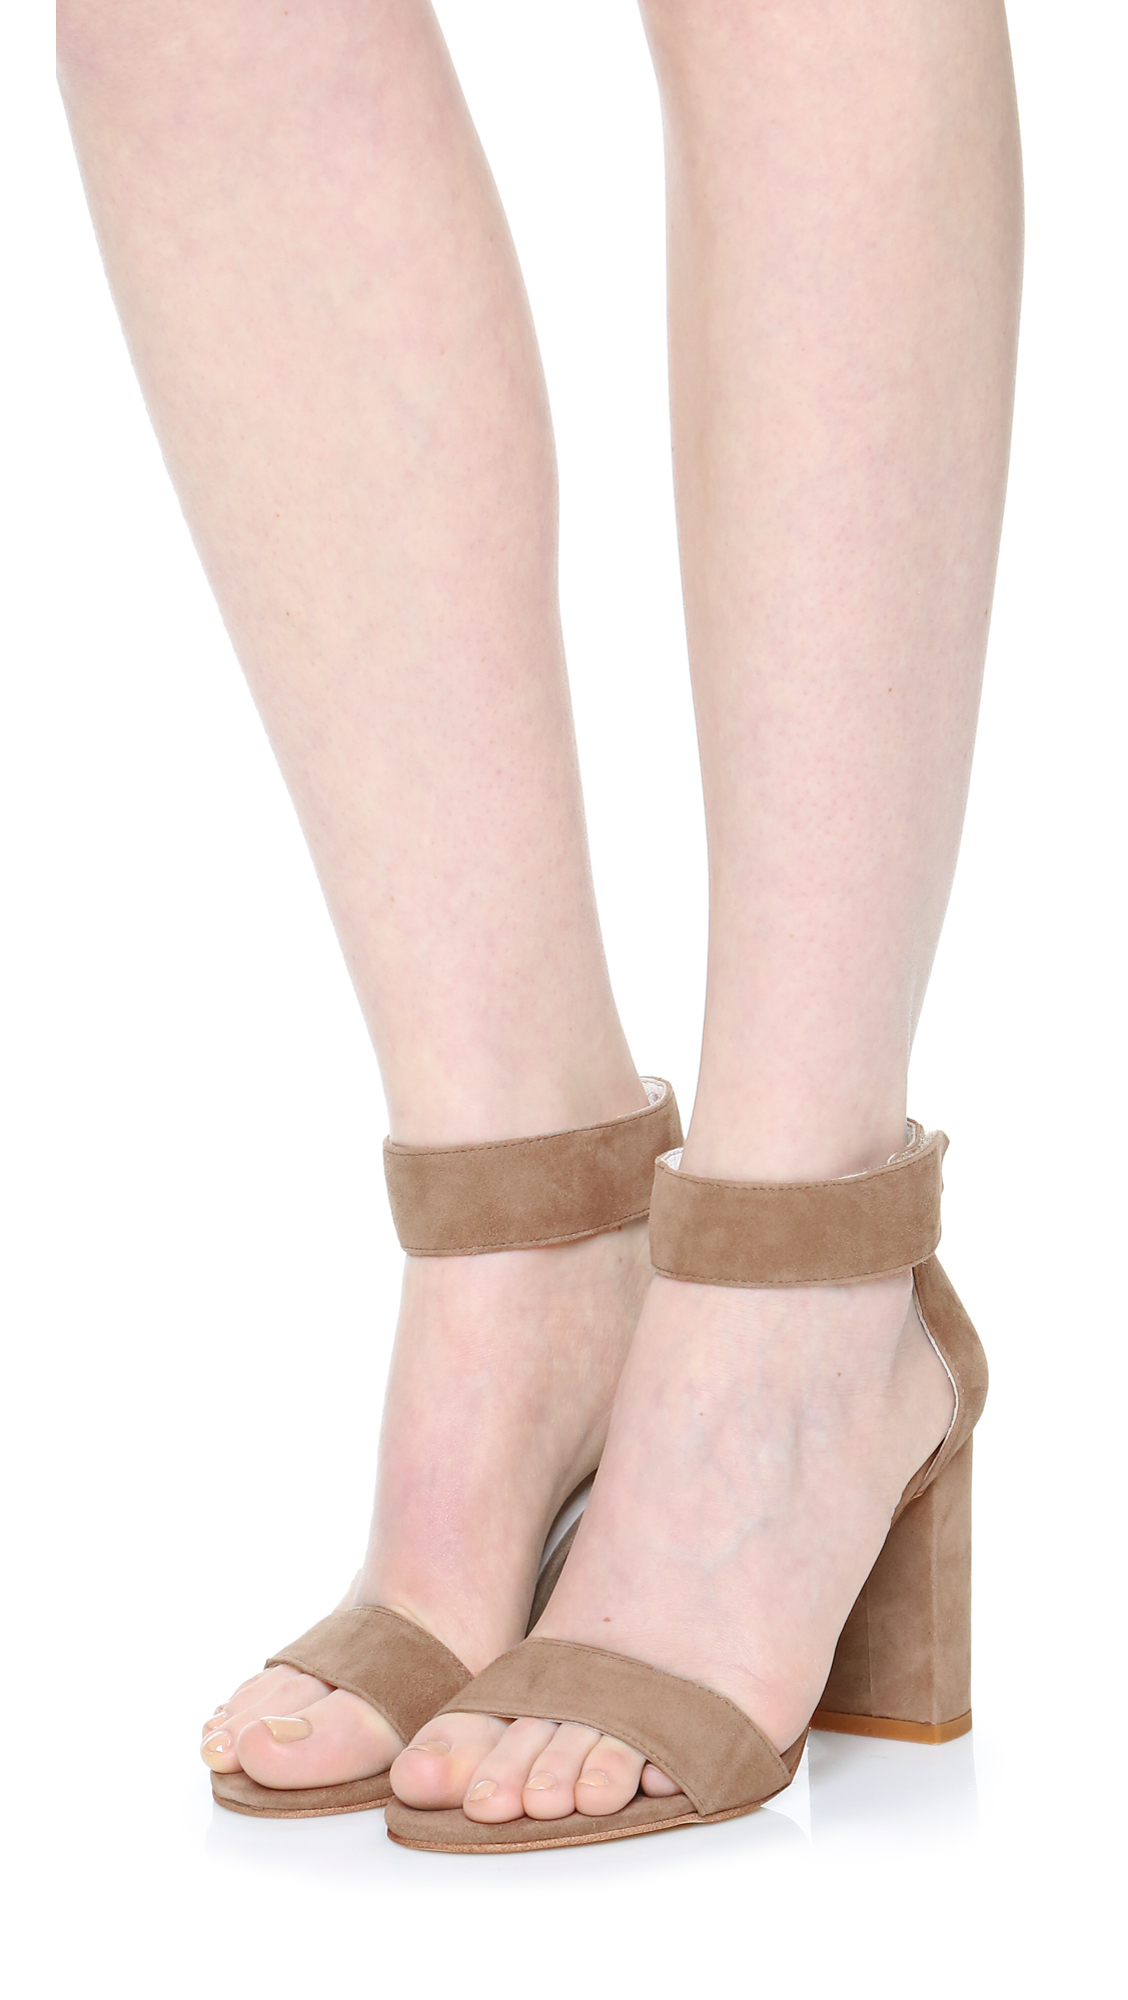 Jeffrey Campbell Women's 'Lindsay' Ankle Strap Sandal 6ySa5